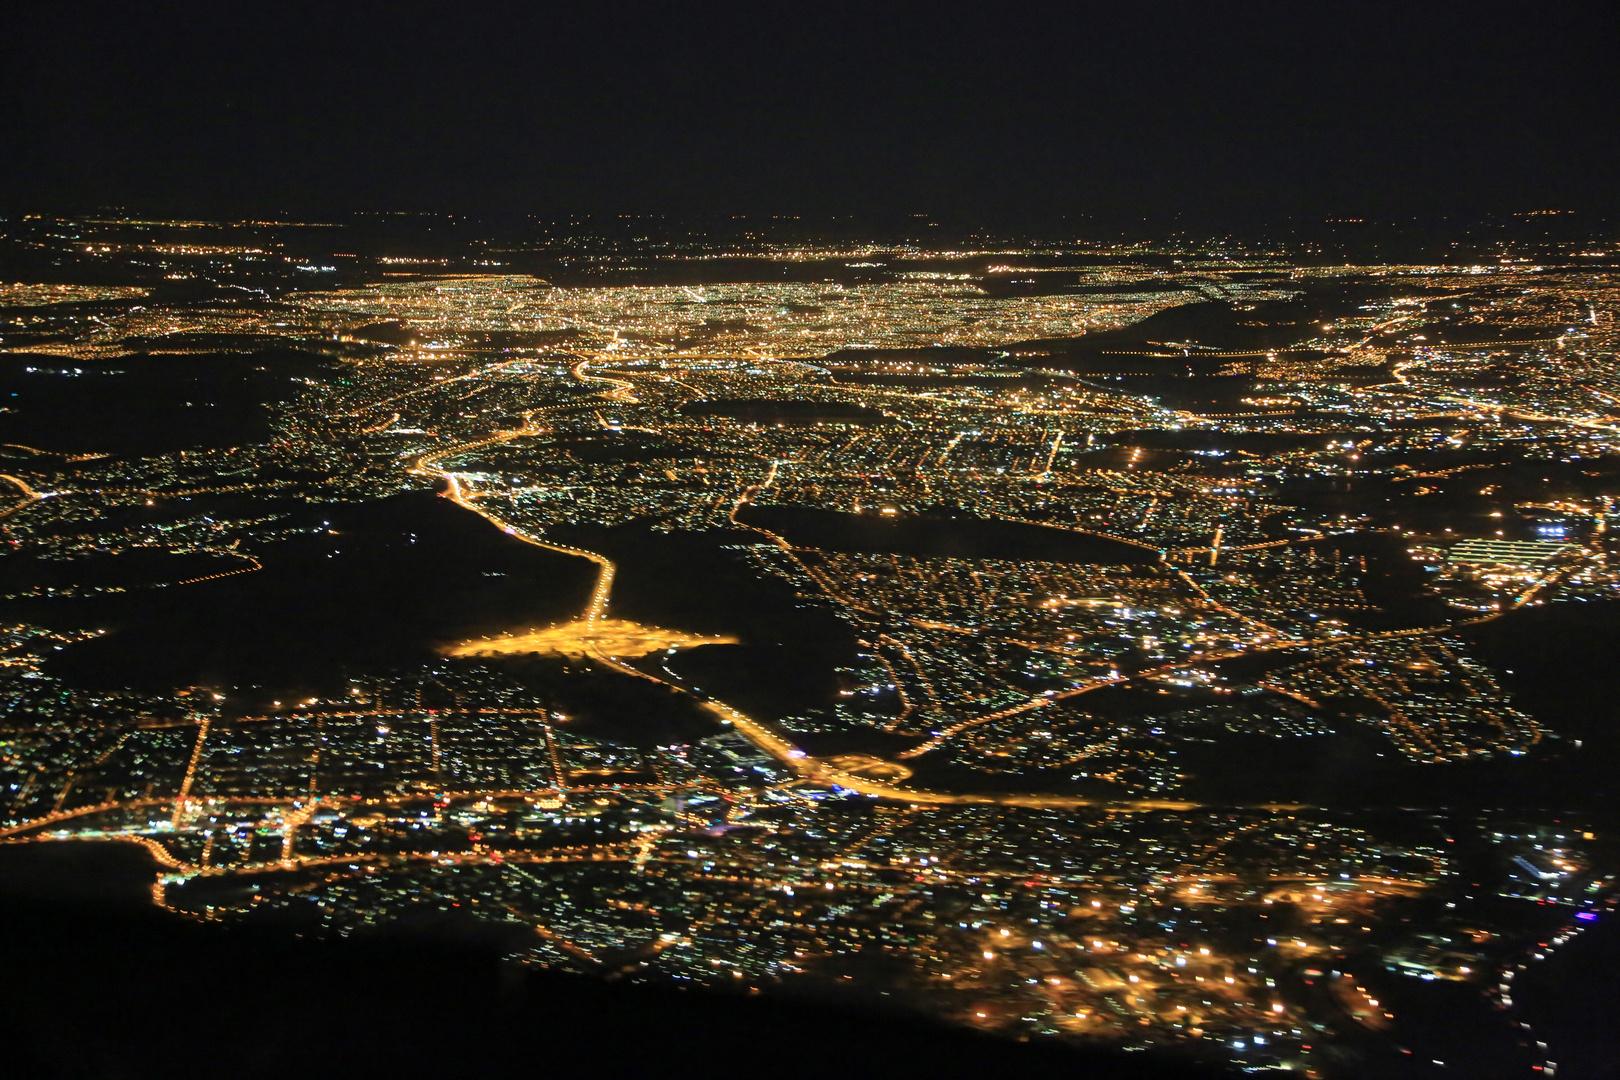 Johannesburg/Südafrika am Abend